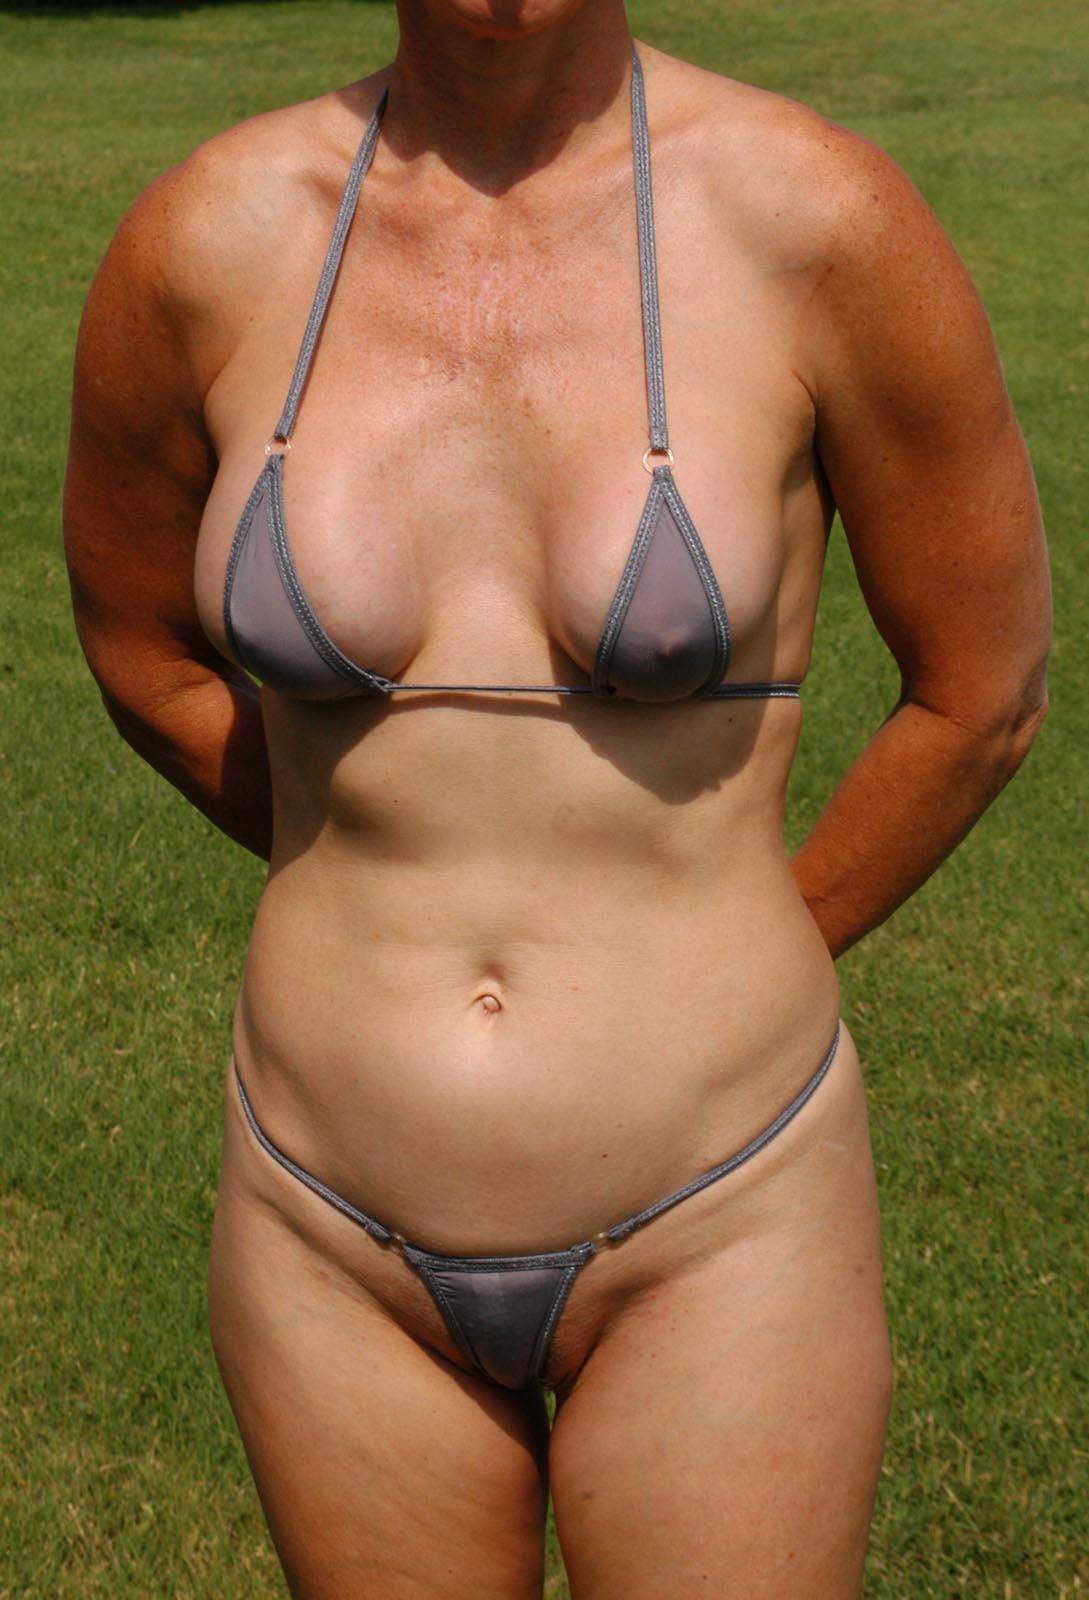 Sheer g string bikini